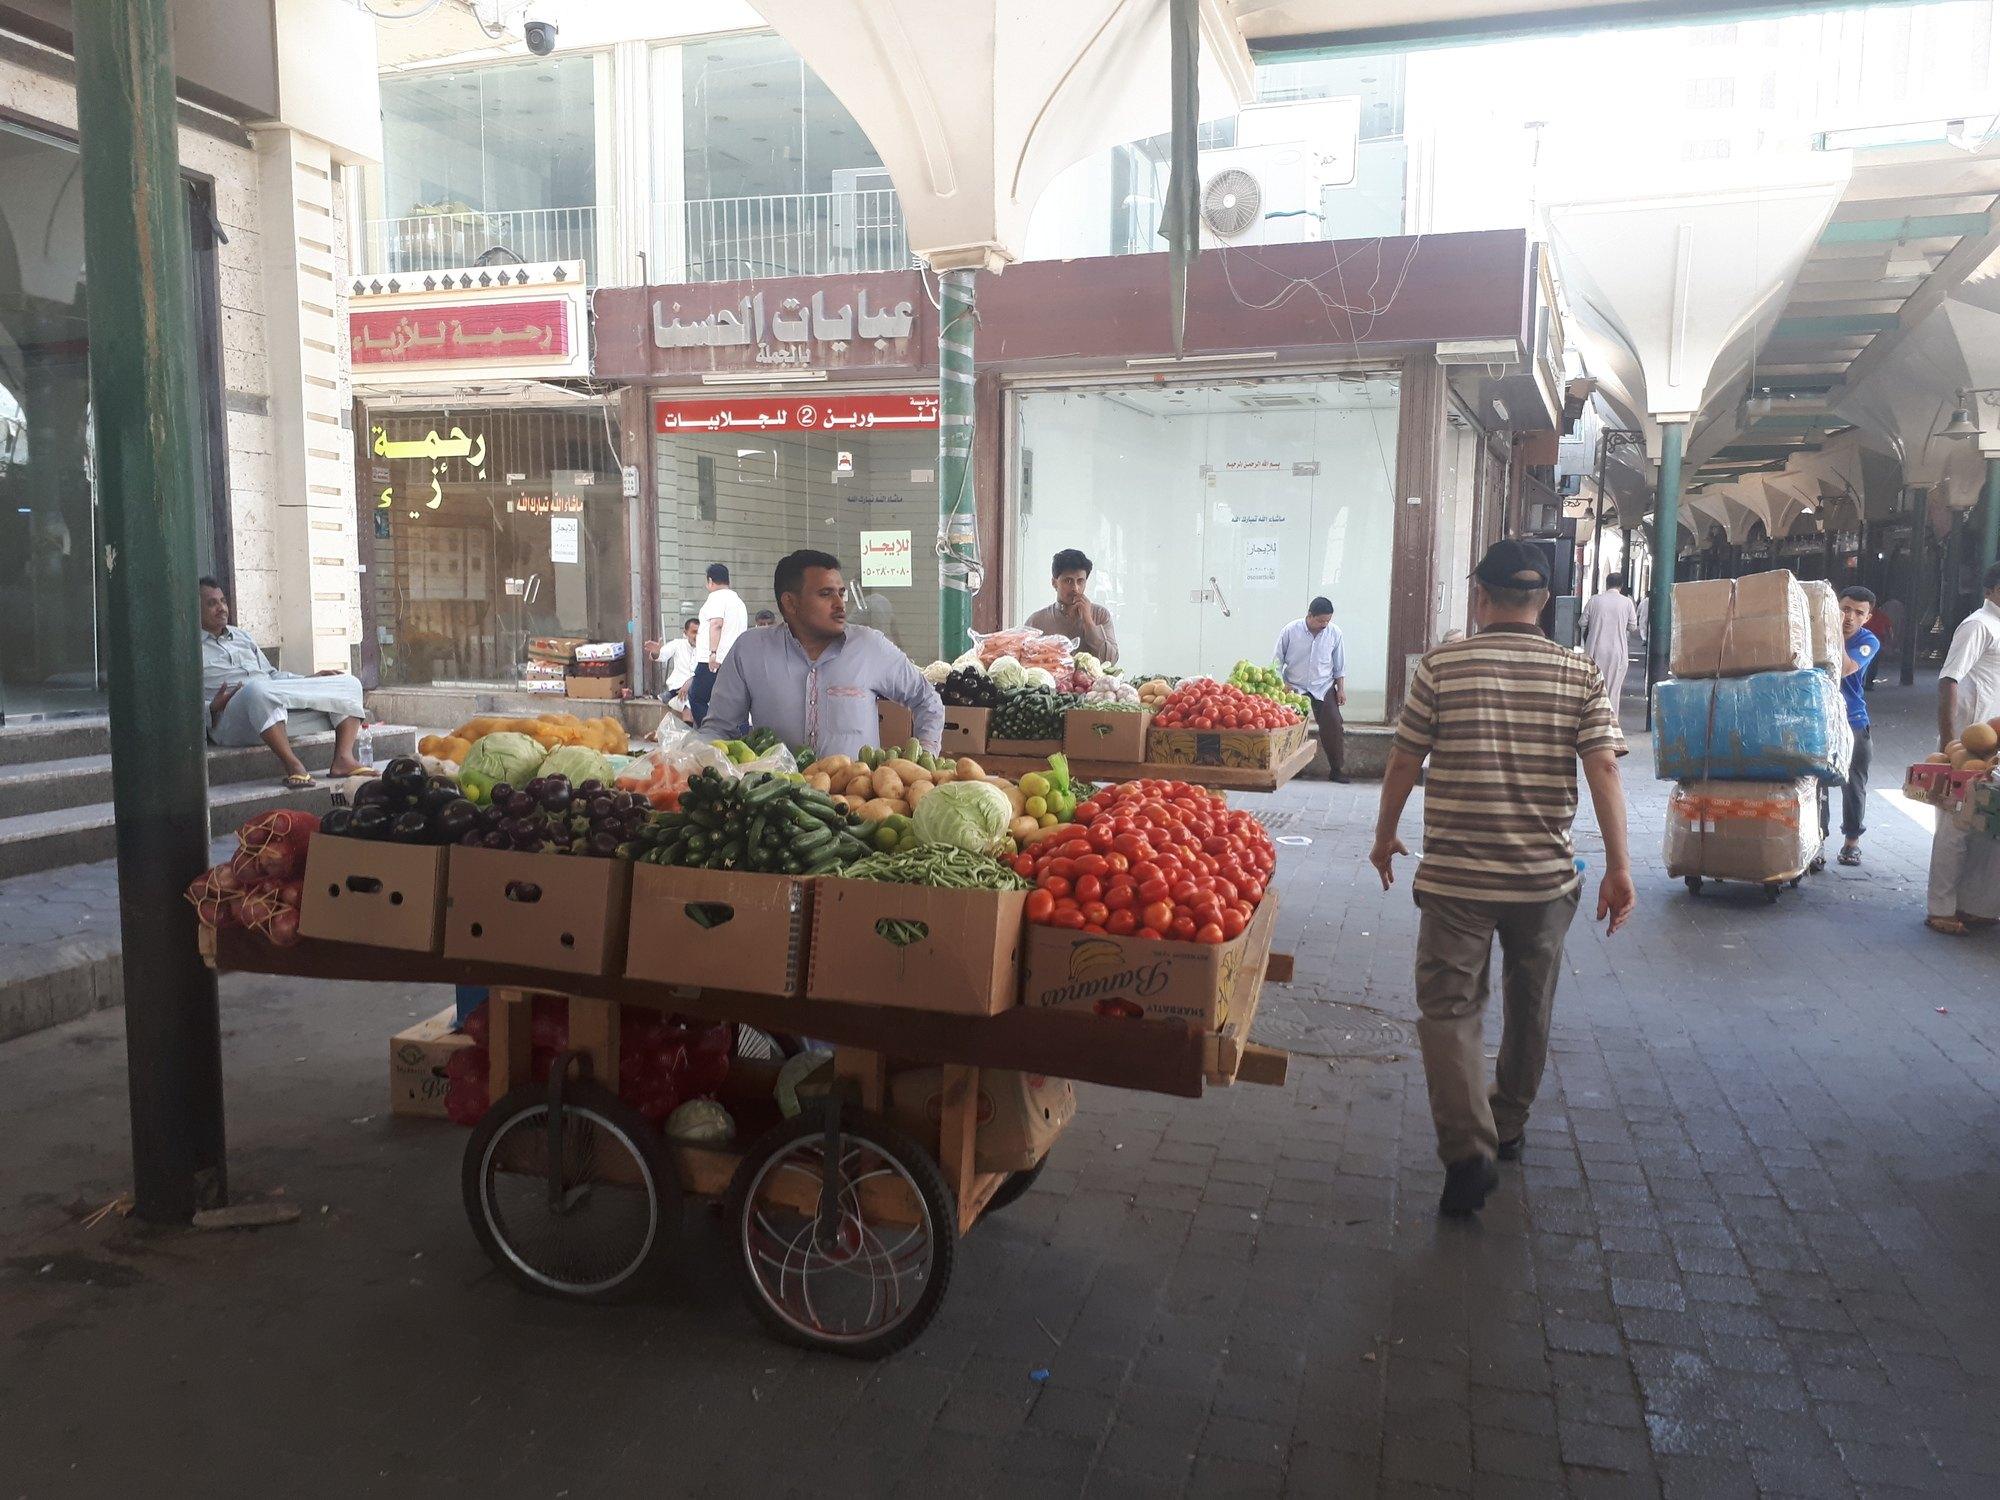 Backpacking in Saudi Arabia: Top 7 Sights in Jeddah's UNESCO